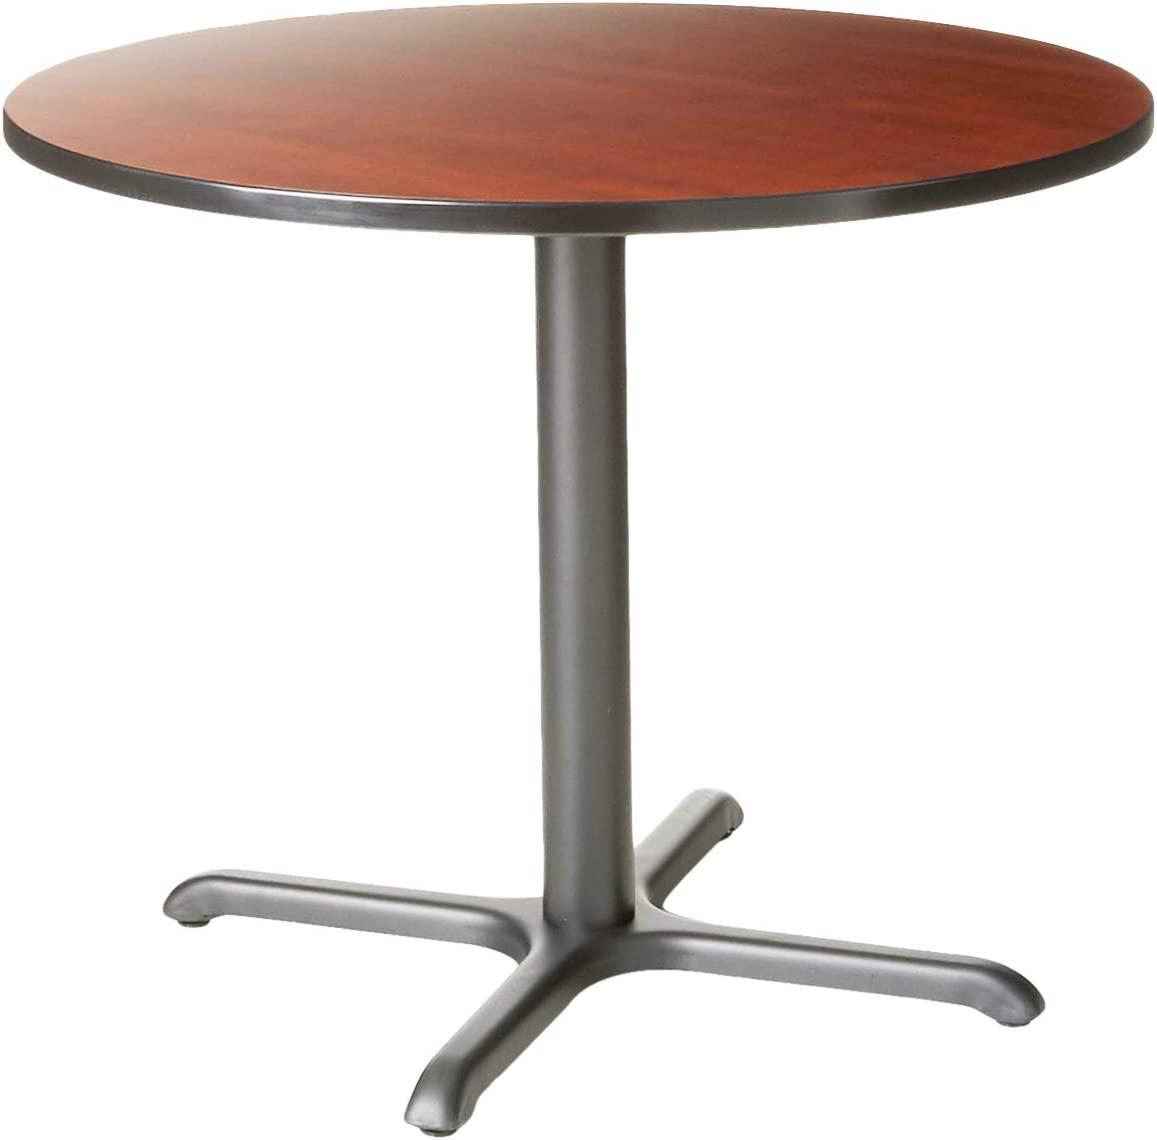 "Cain 36"" Round Breakroom Table- Cherry"